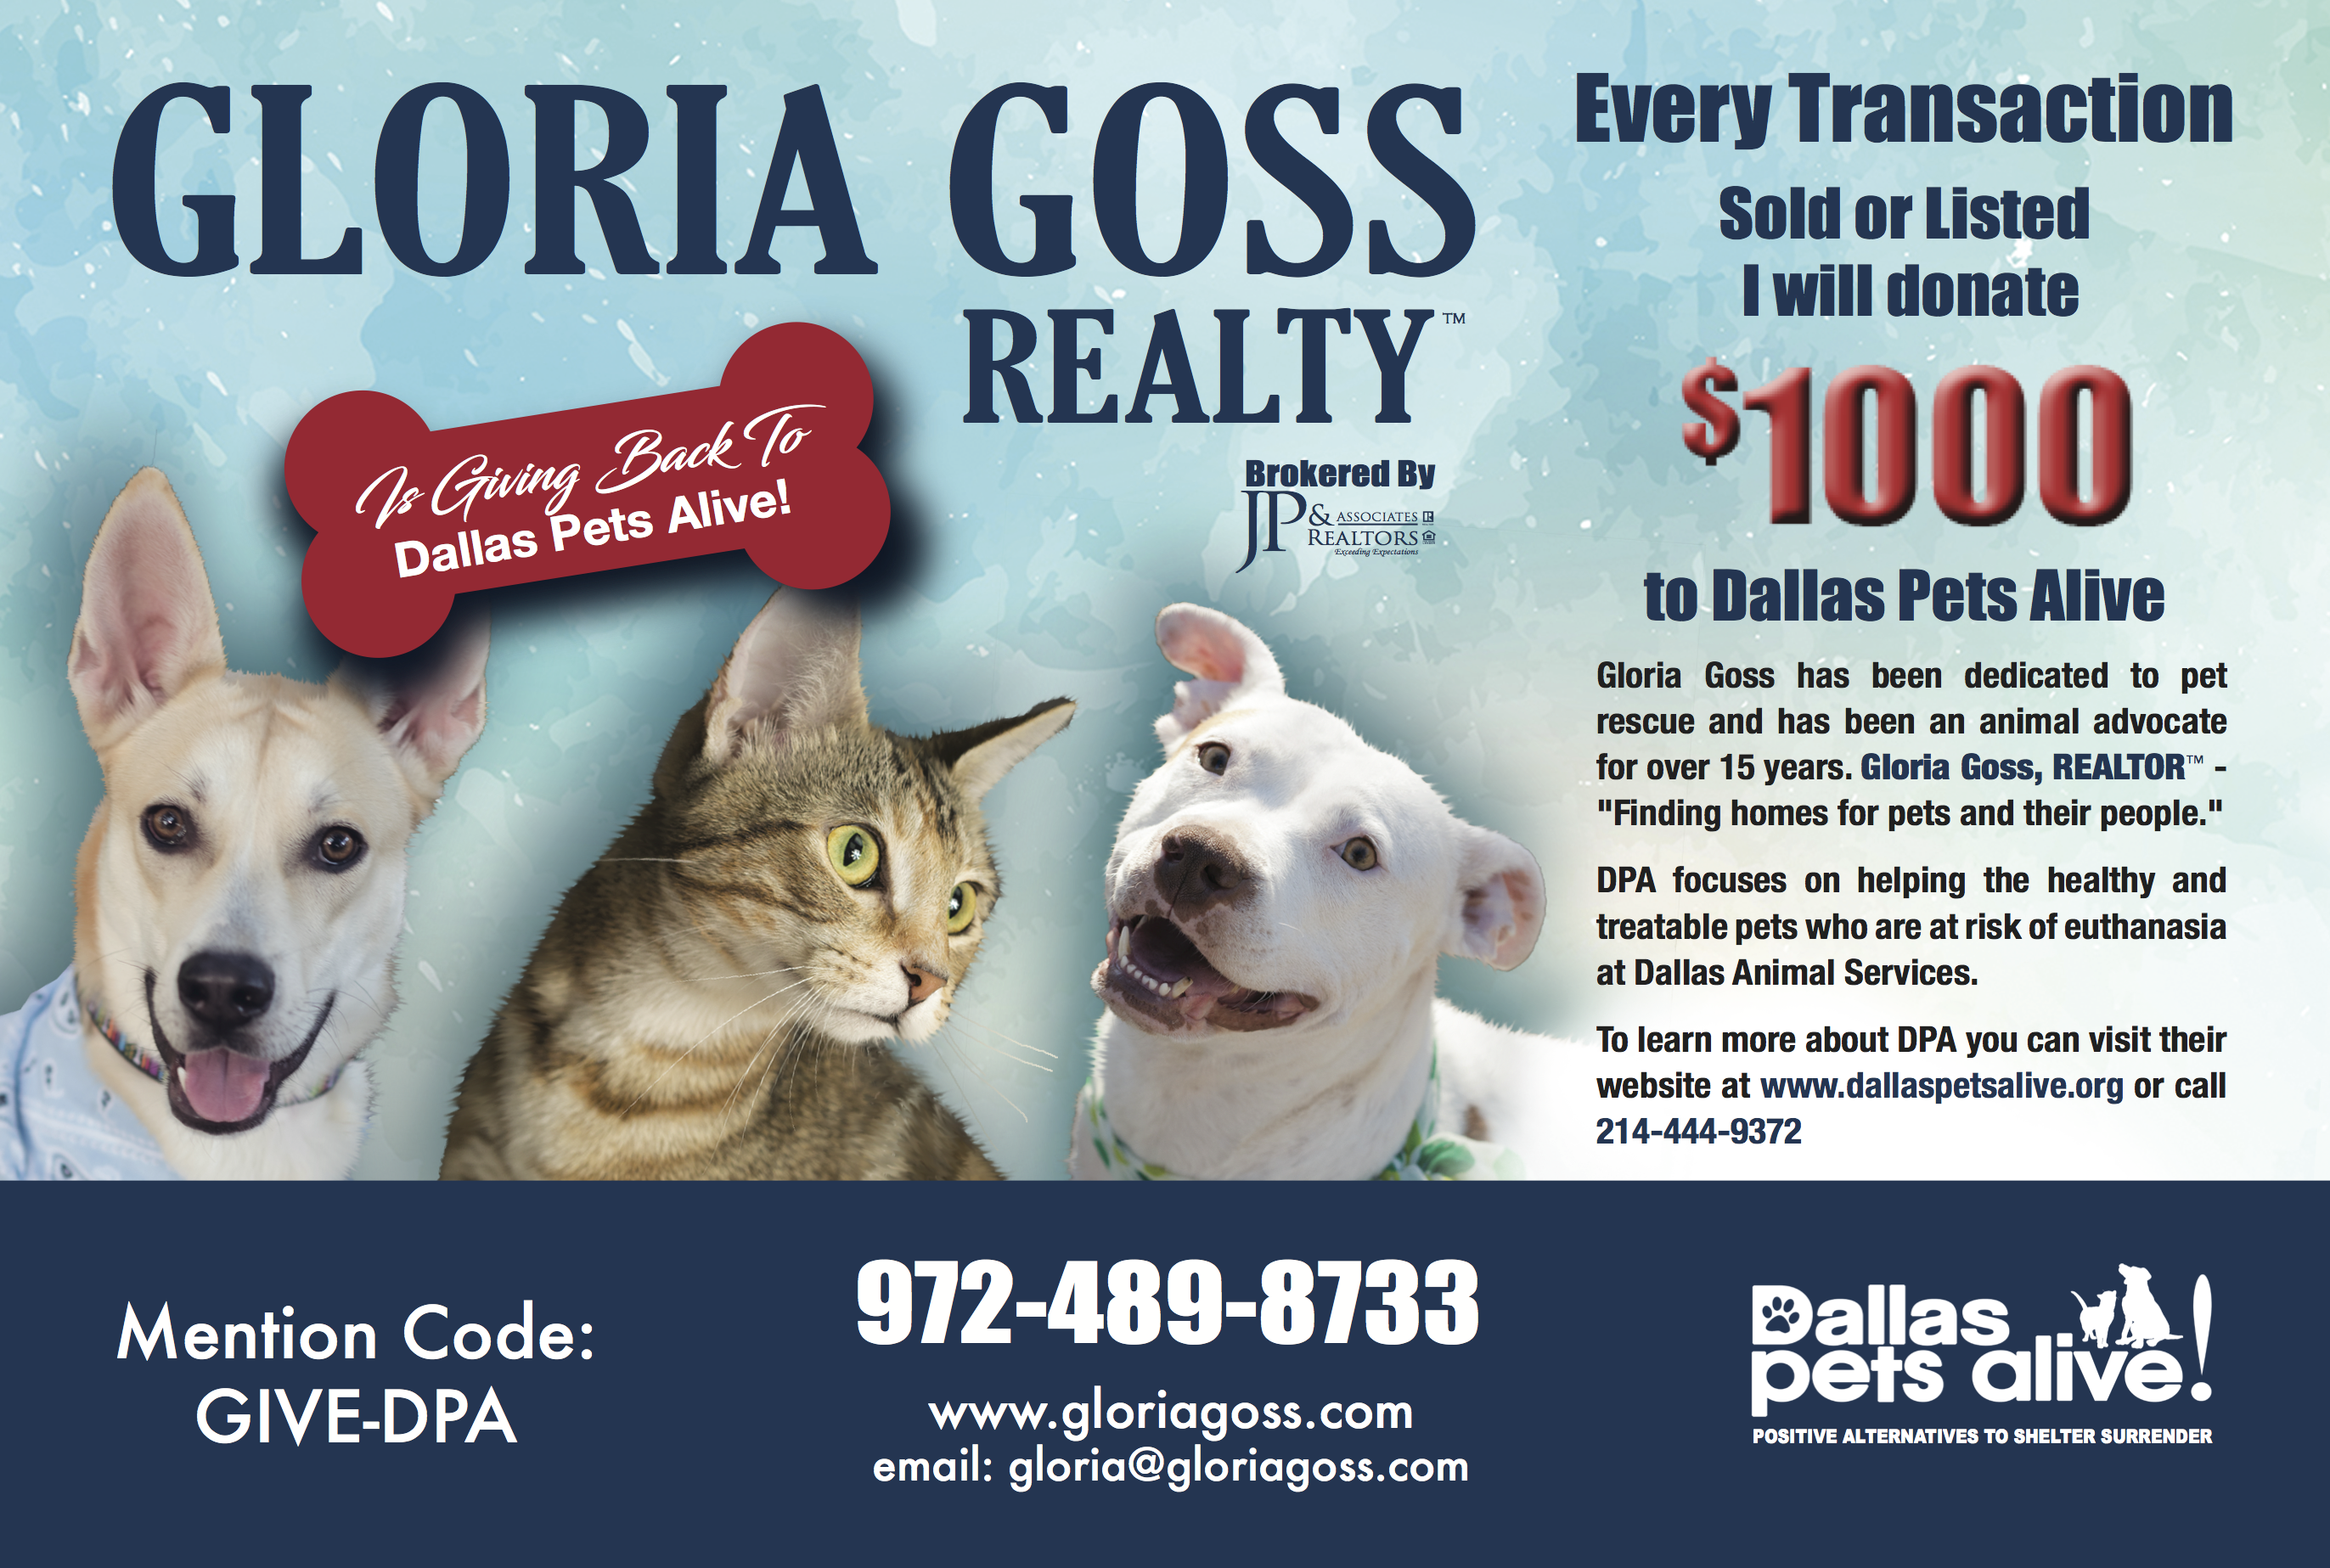 Gloria Goss Realty